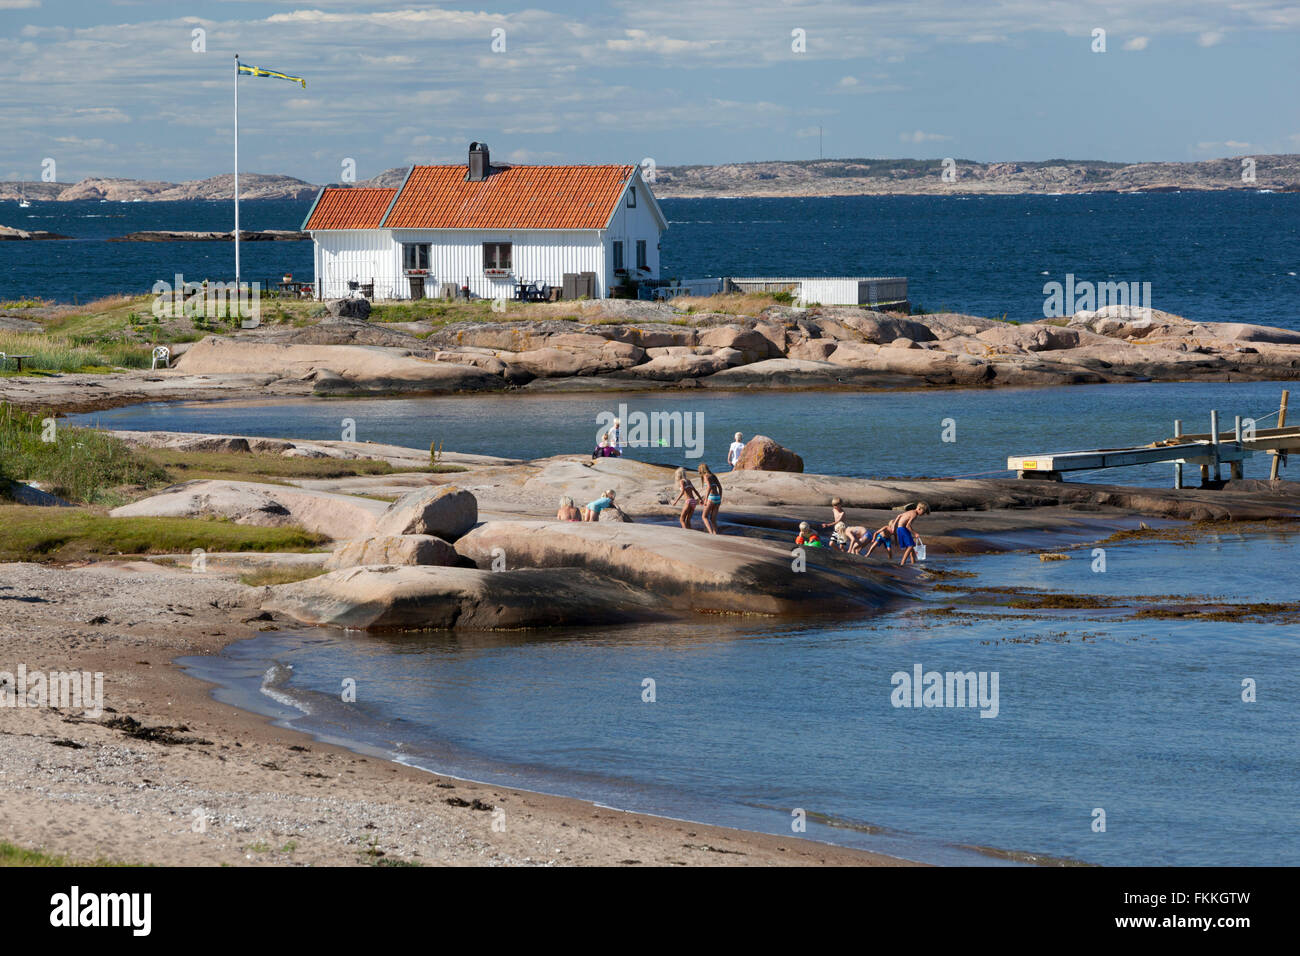 Ramsvik beach, Hunnebostrstrand, Bohuslän Coast, Southwest Sweden, Sweden, Scandinavia, Europe - Stock Image